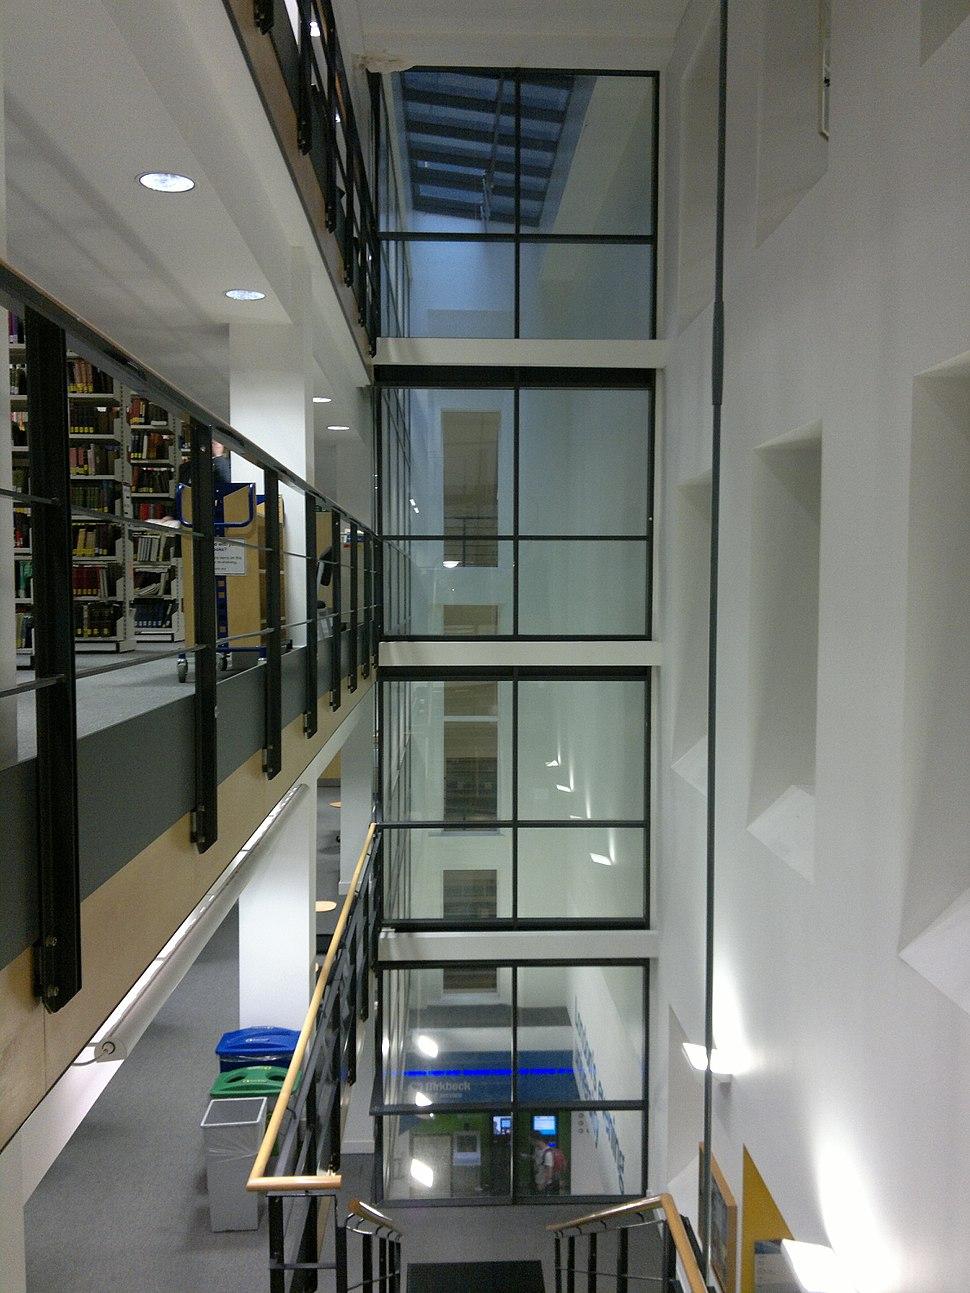 Birkbeck College library interior 11.06.13